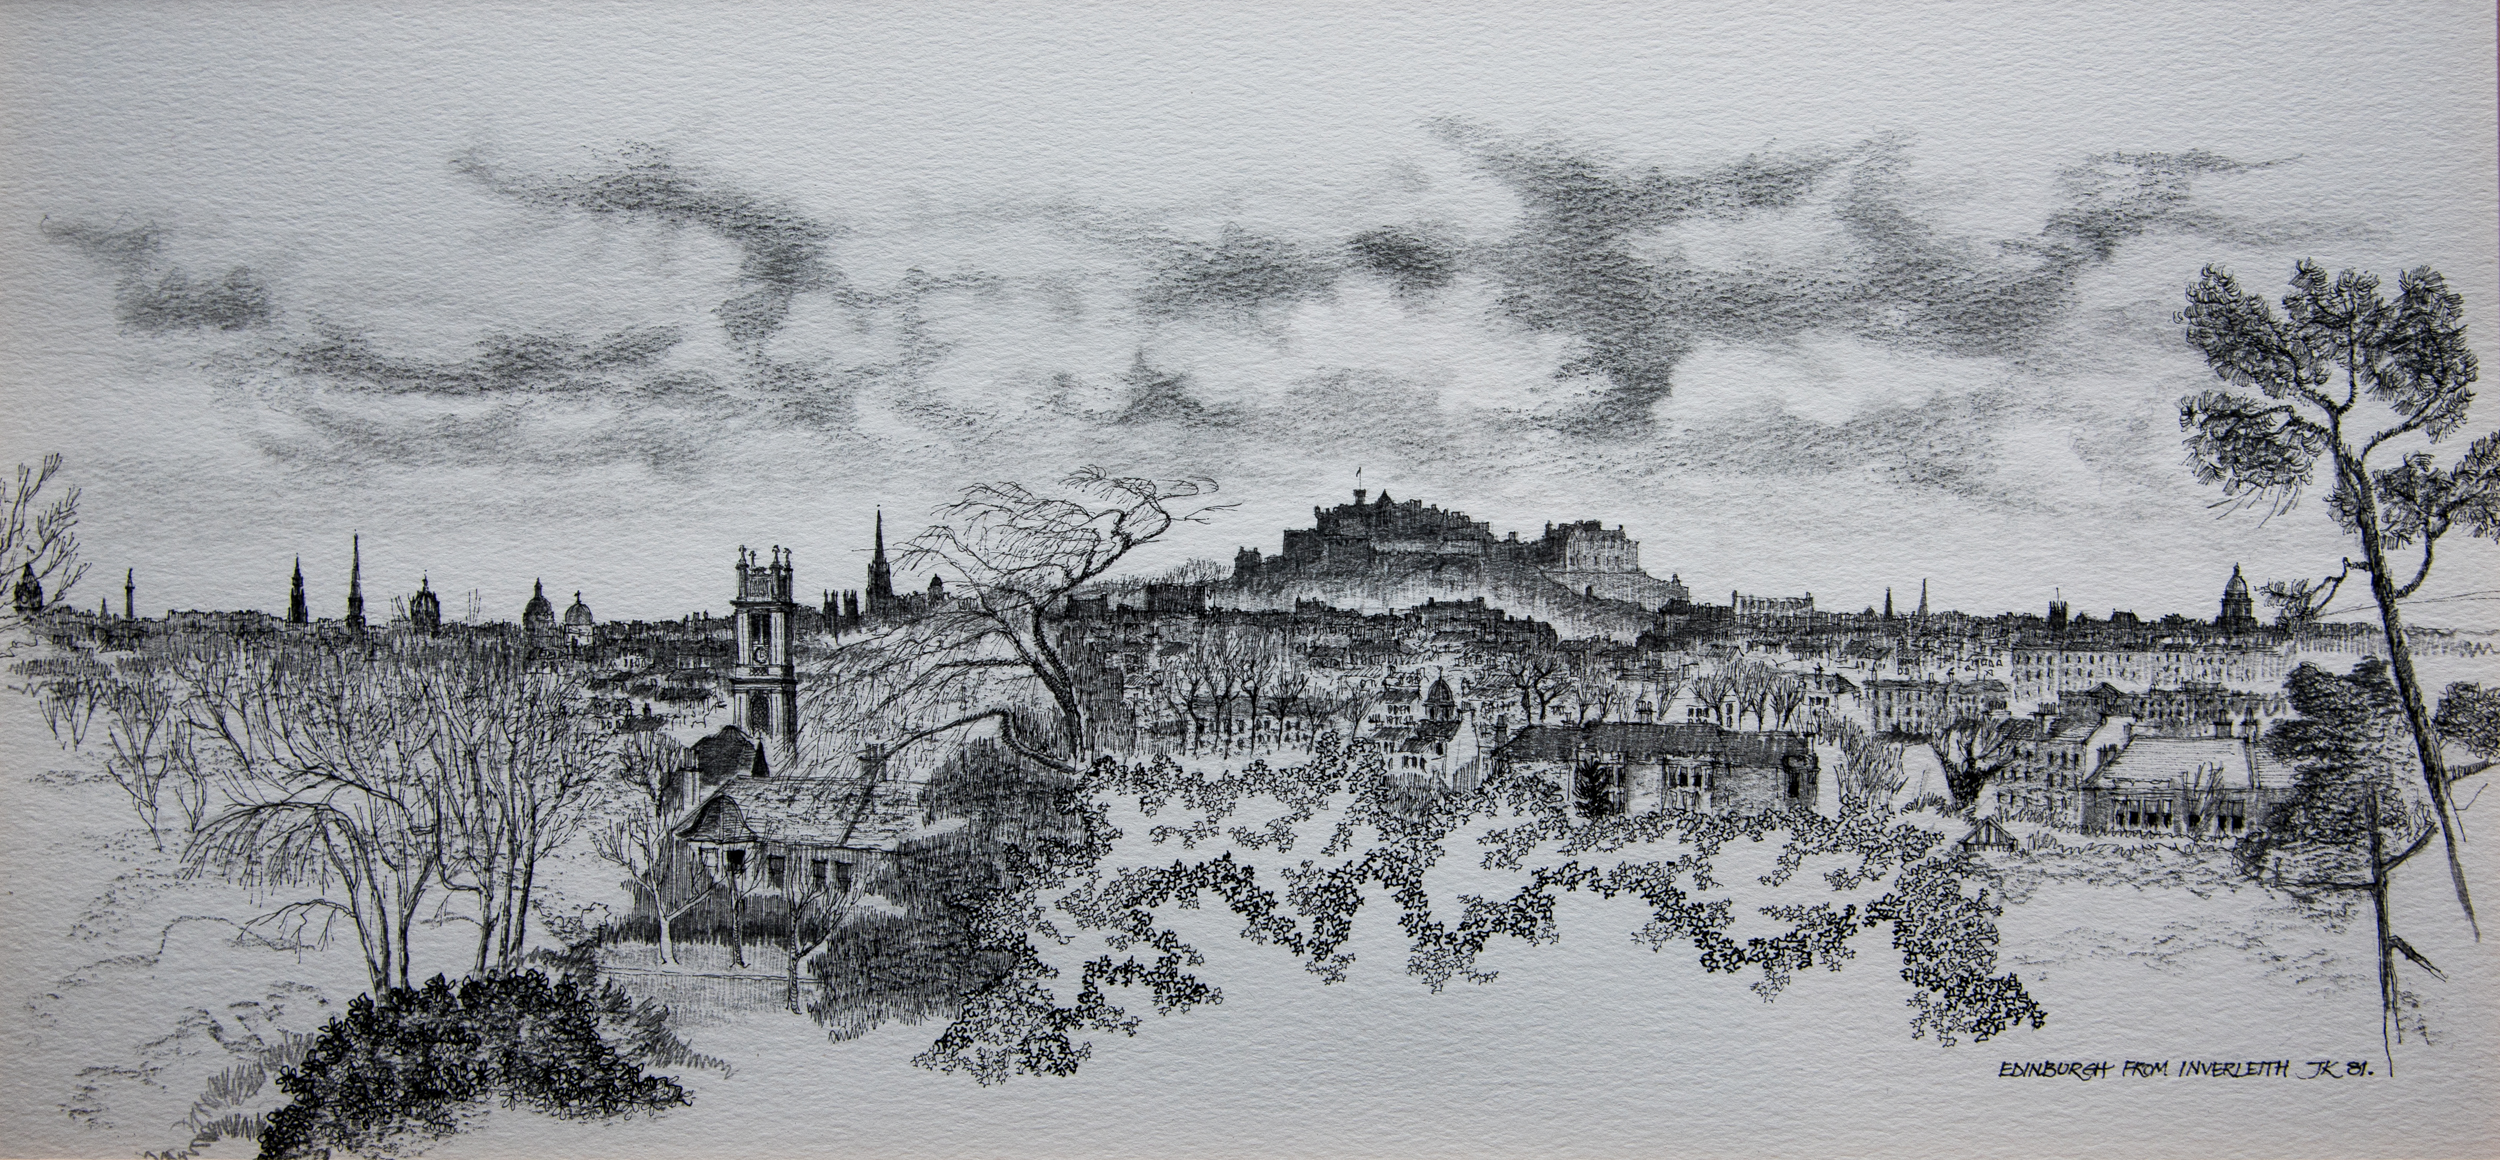 A panorama of Edinburgh in many shades of grey, by John Knight